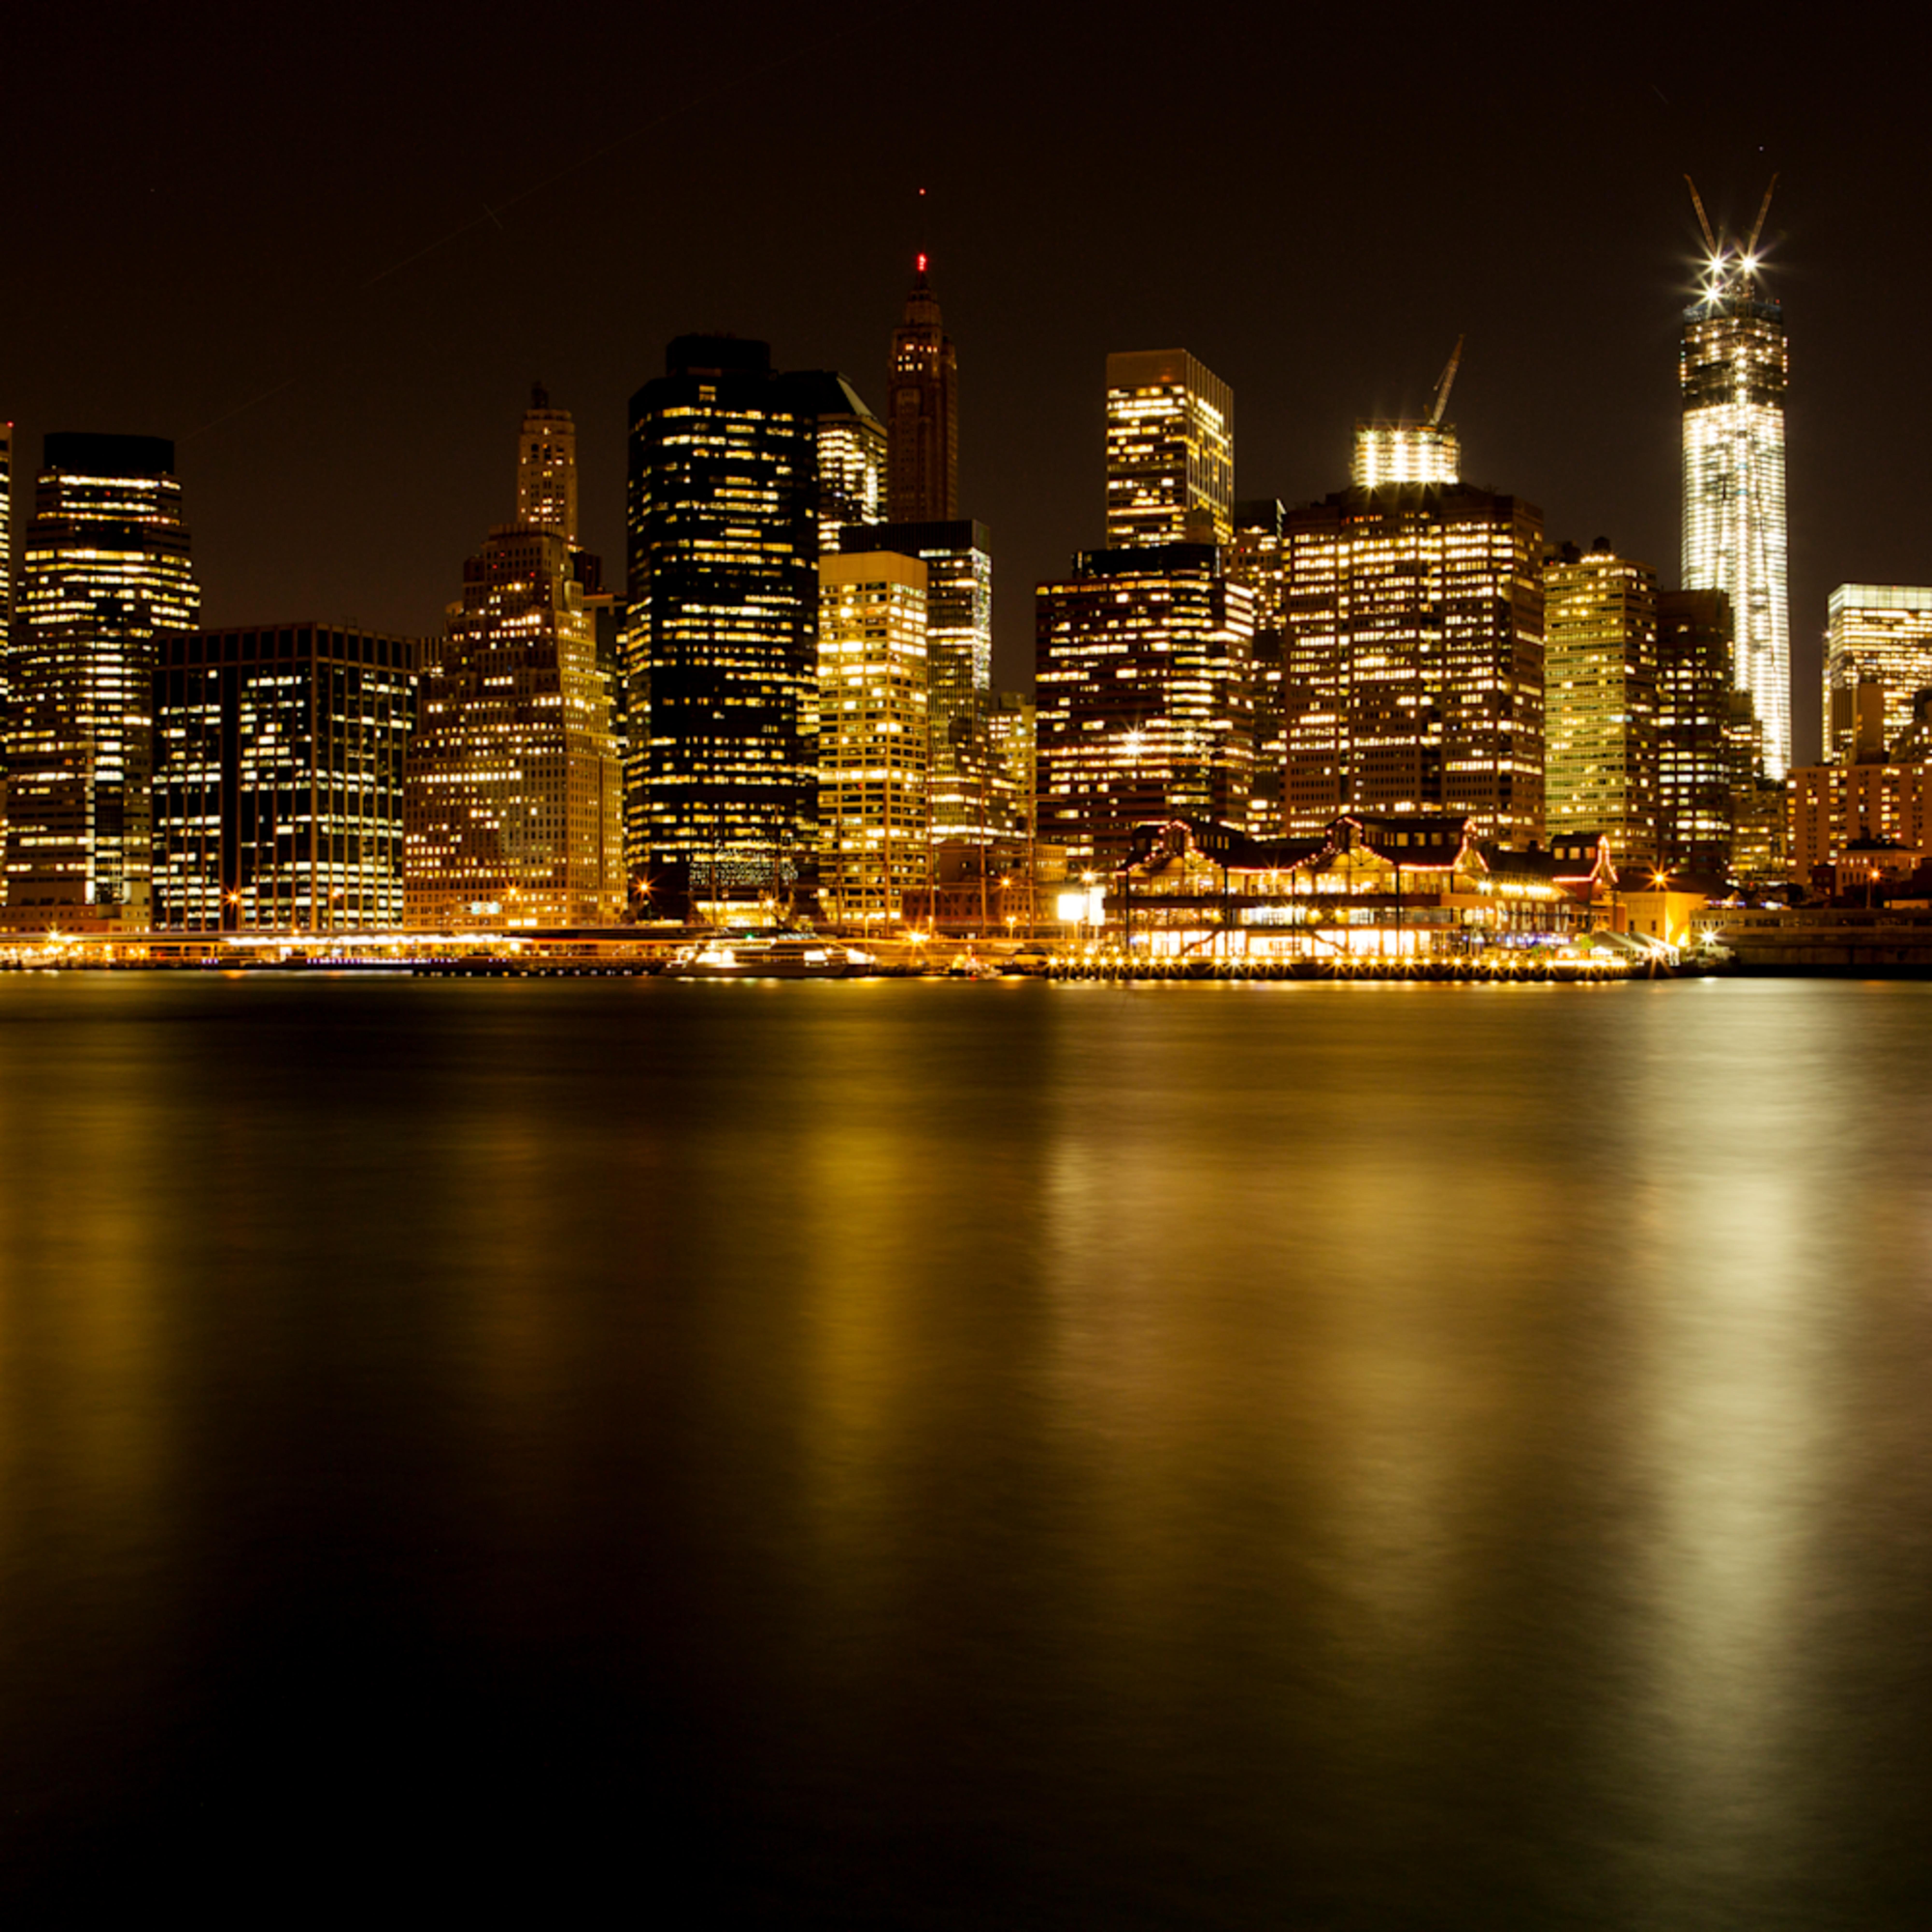 Mbp new york 20120924 1964 2 rvyubw